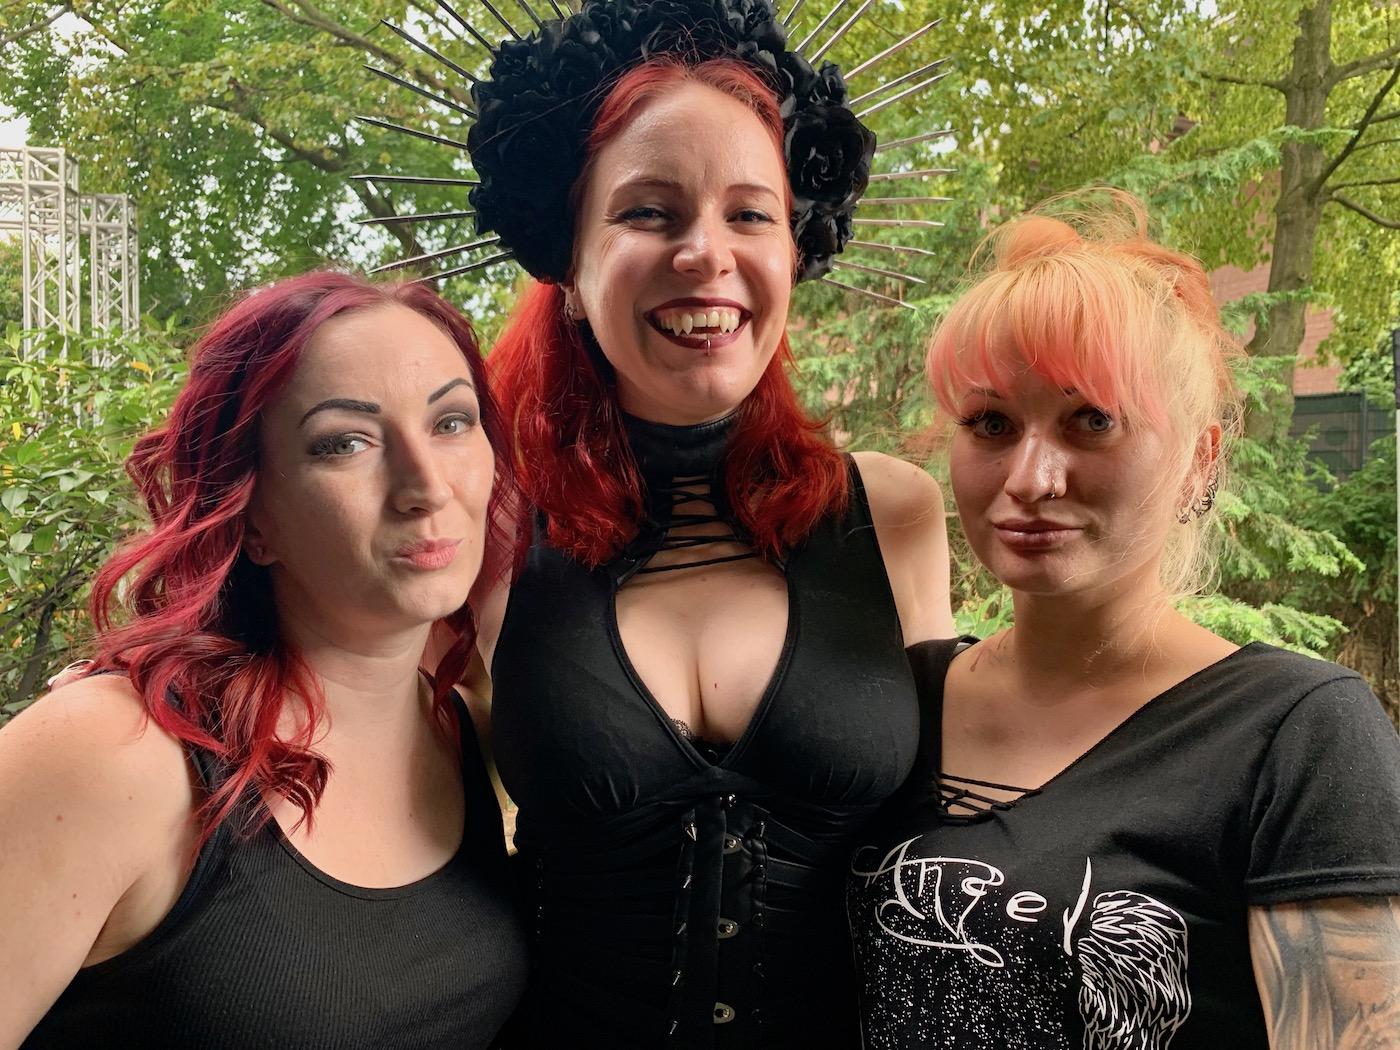 mark_benecke_amphi_festival_koeln_2019 - 41.jpg